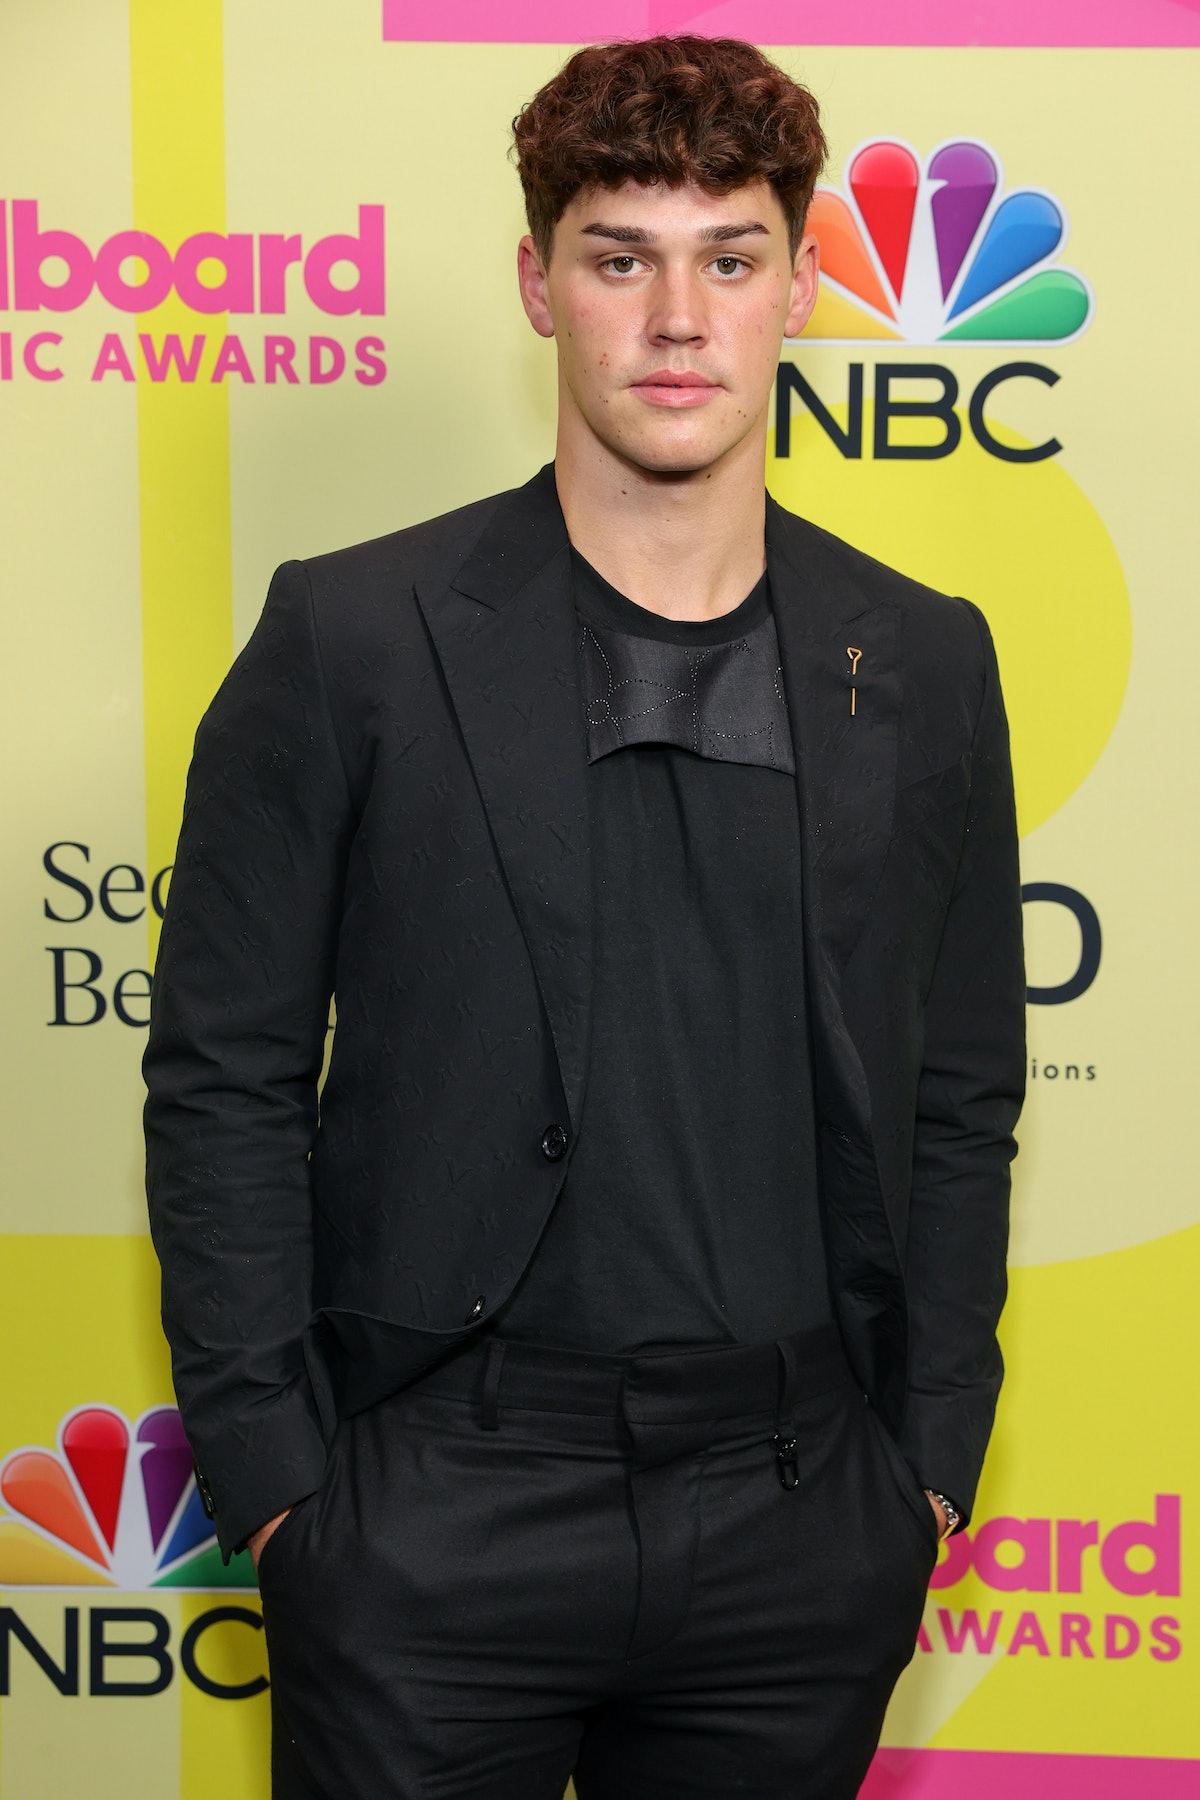 LOS ANGELES, CALIFORNIA - MAY 23: Noah Beck poses backstage for the 2021 Billboard Music Awards, bro...